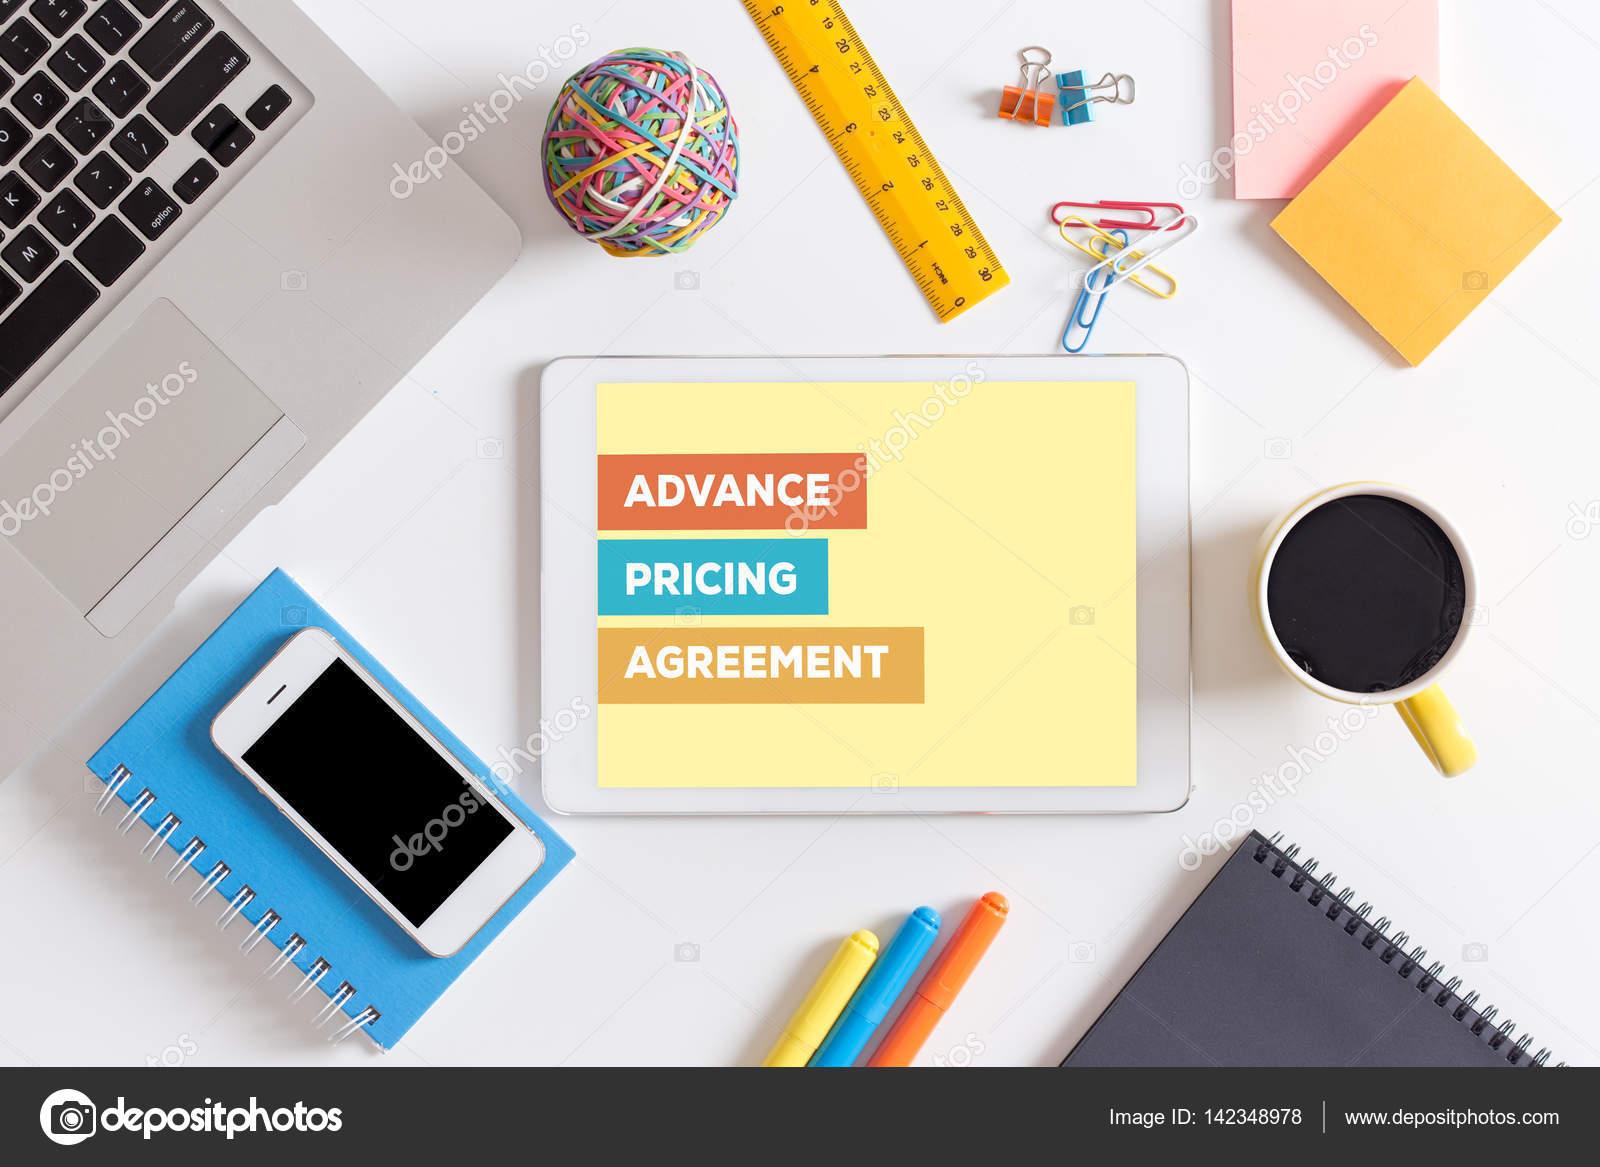 Advance Pricing Agreement Concept Stock Photo Garagestock 142348978